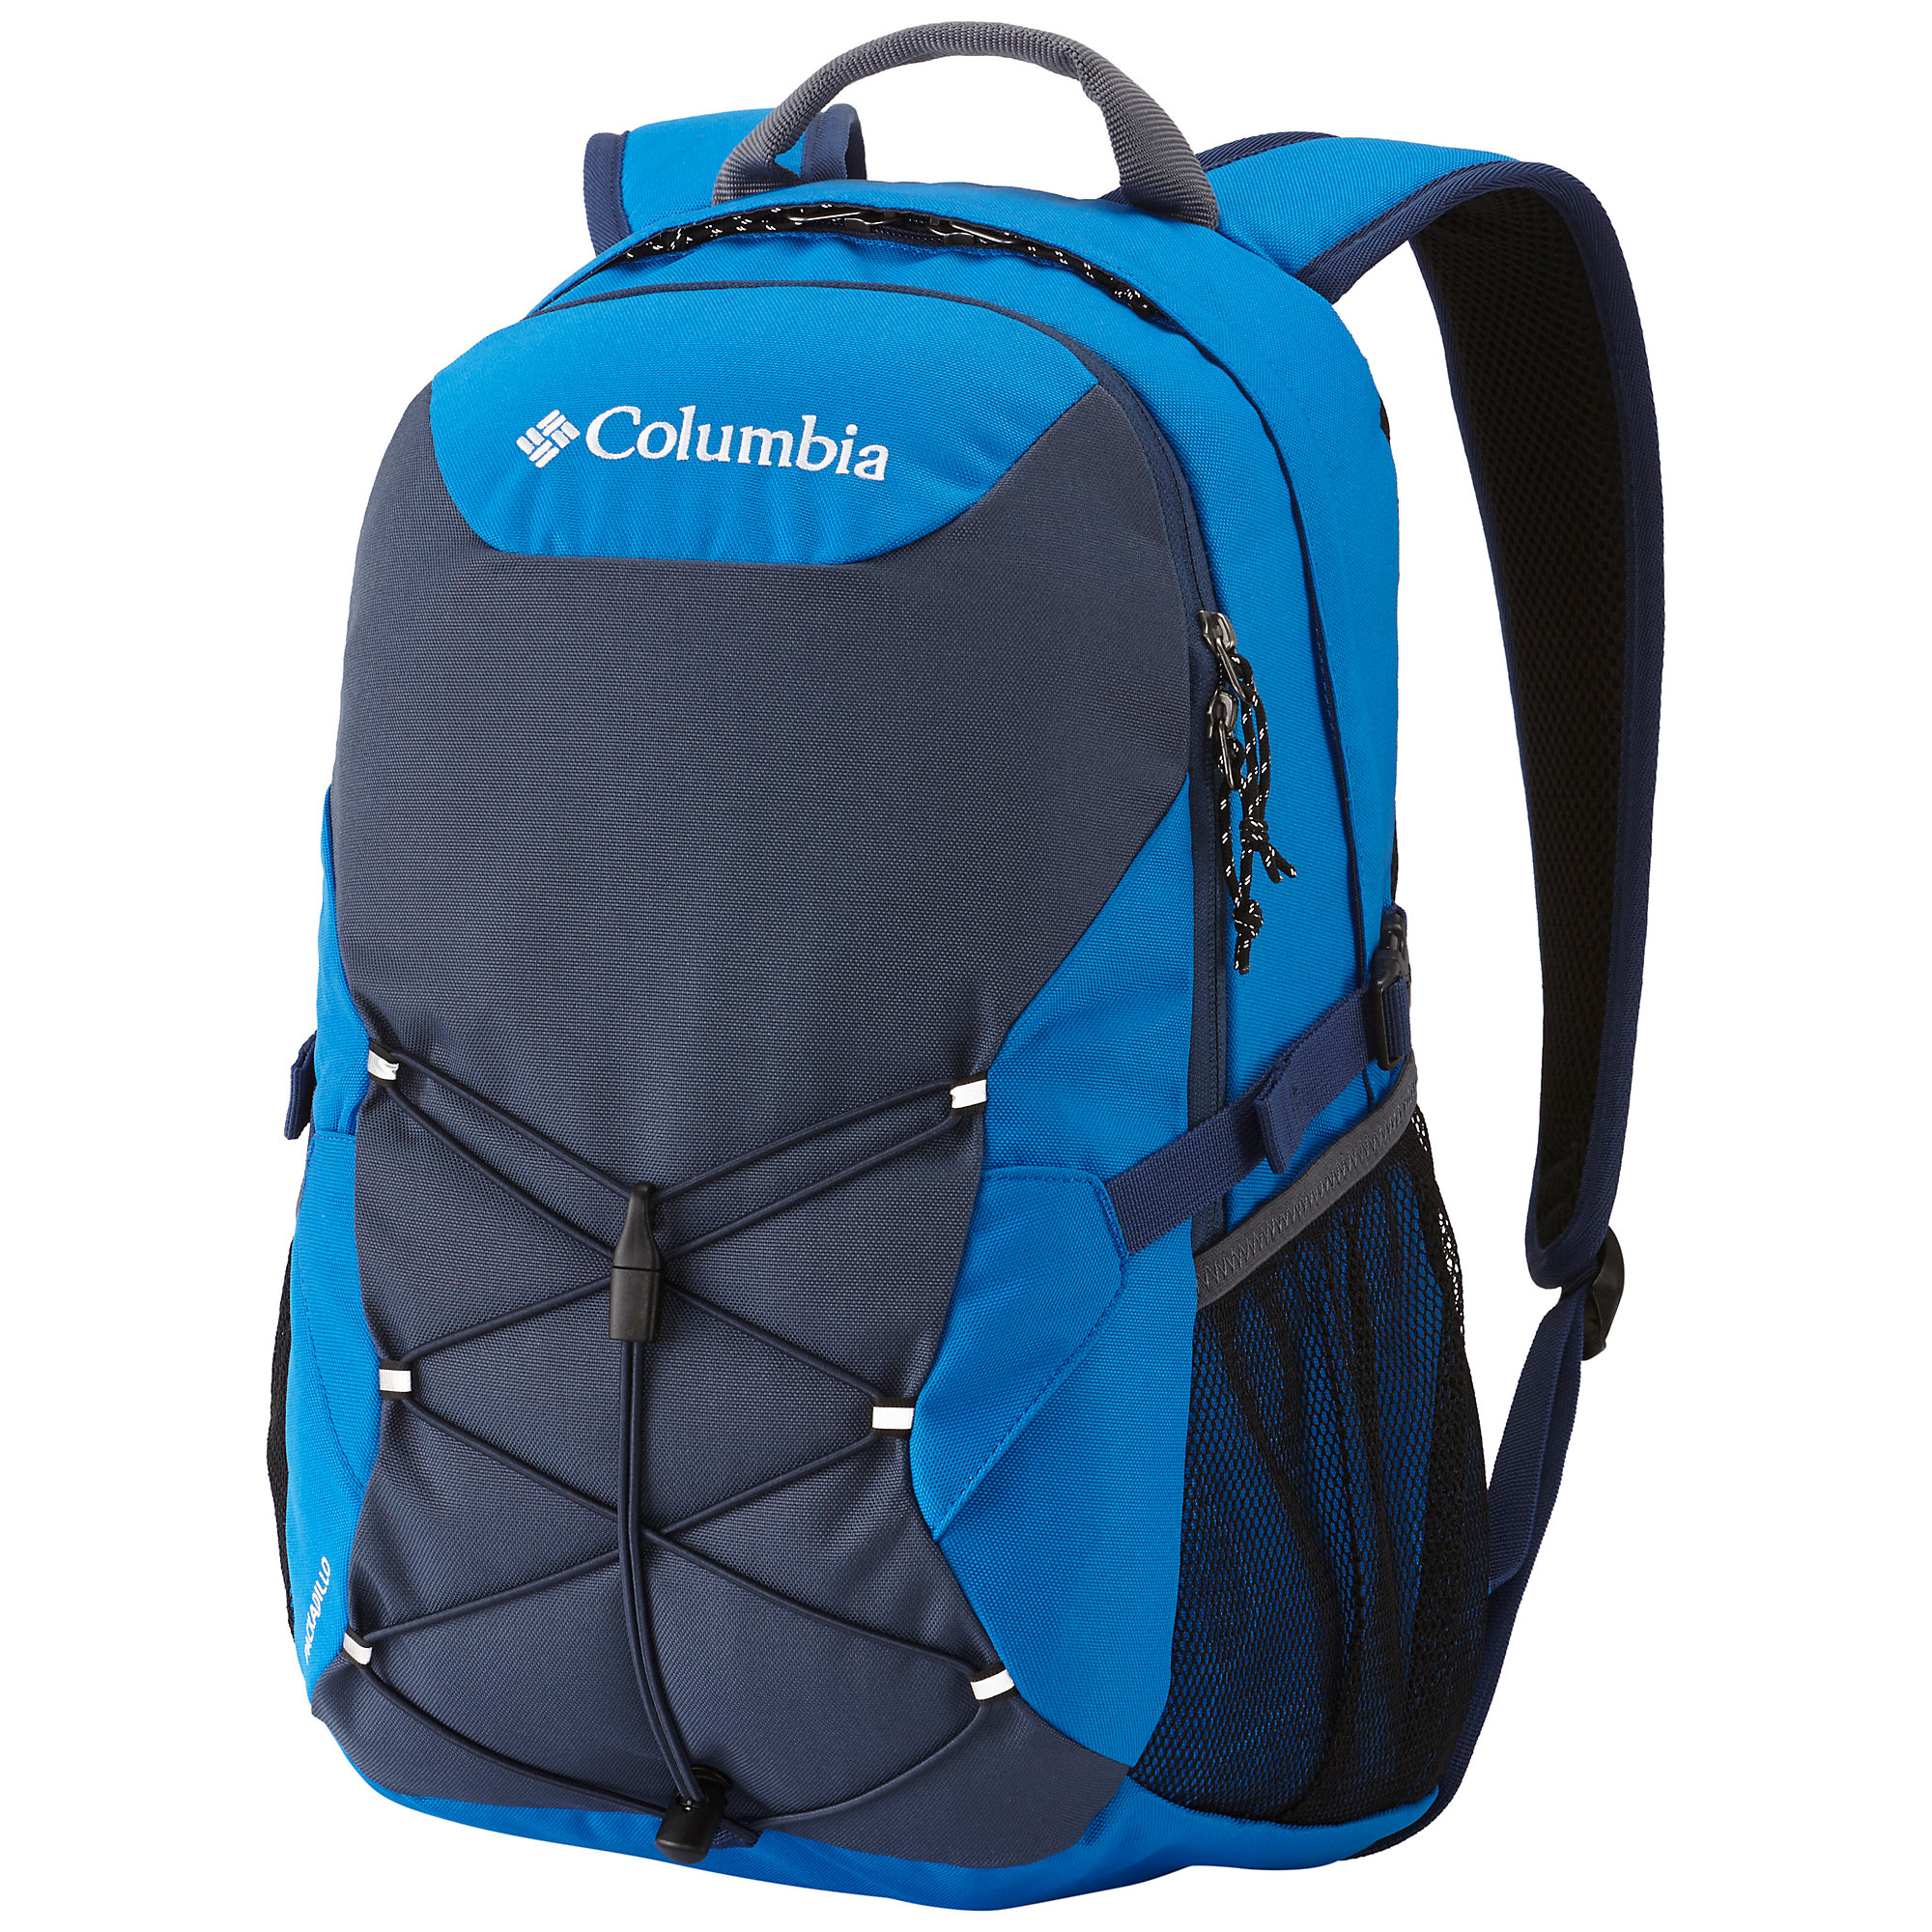 Columbia Packadillo Daypack